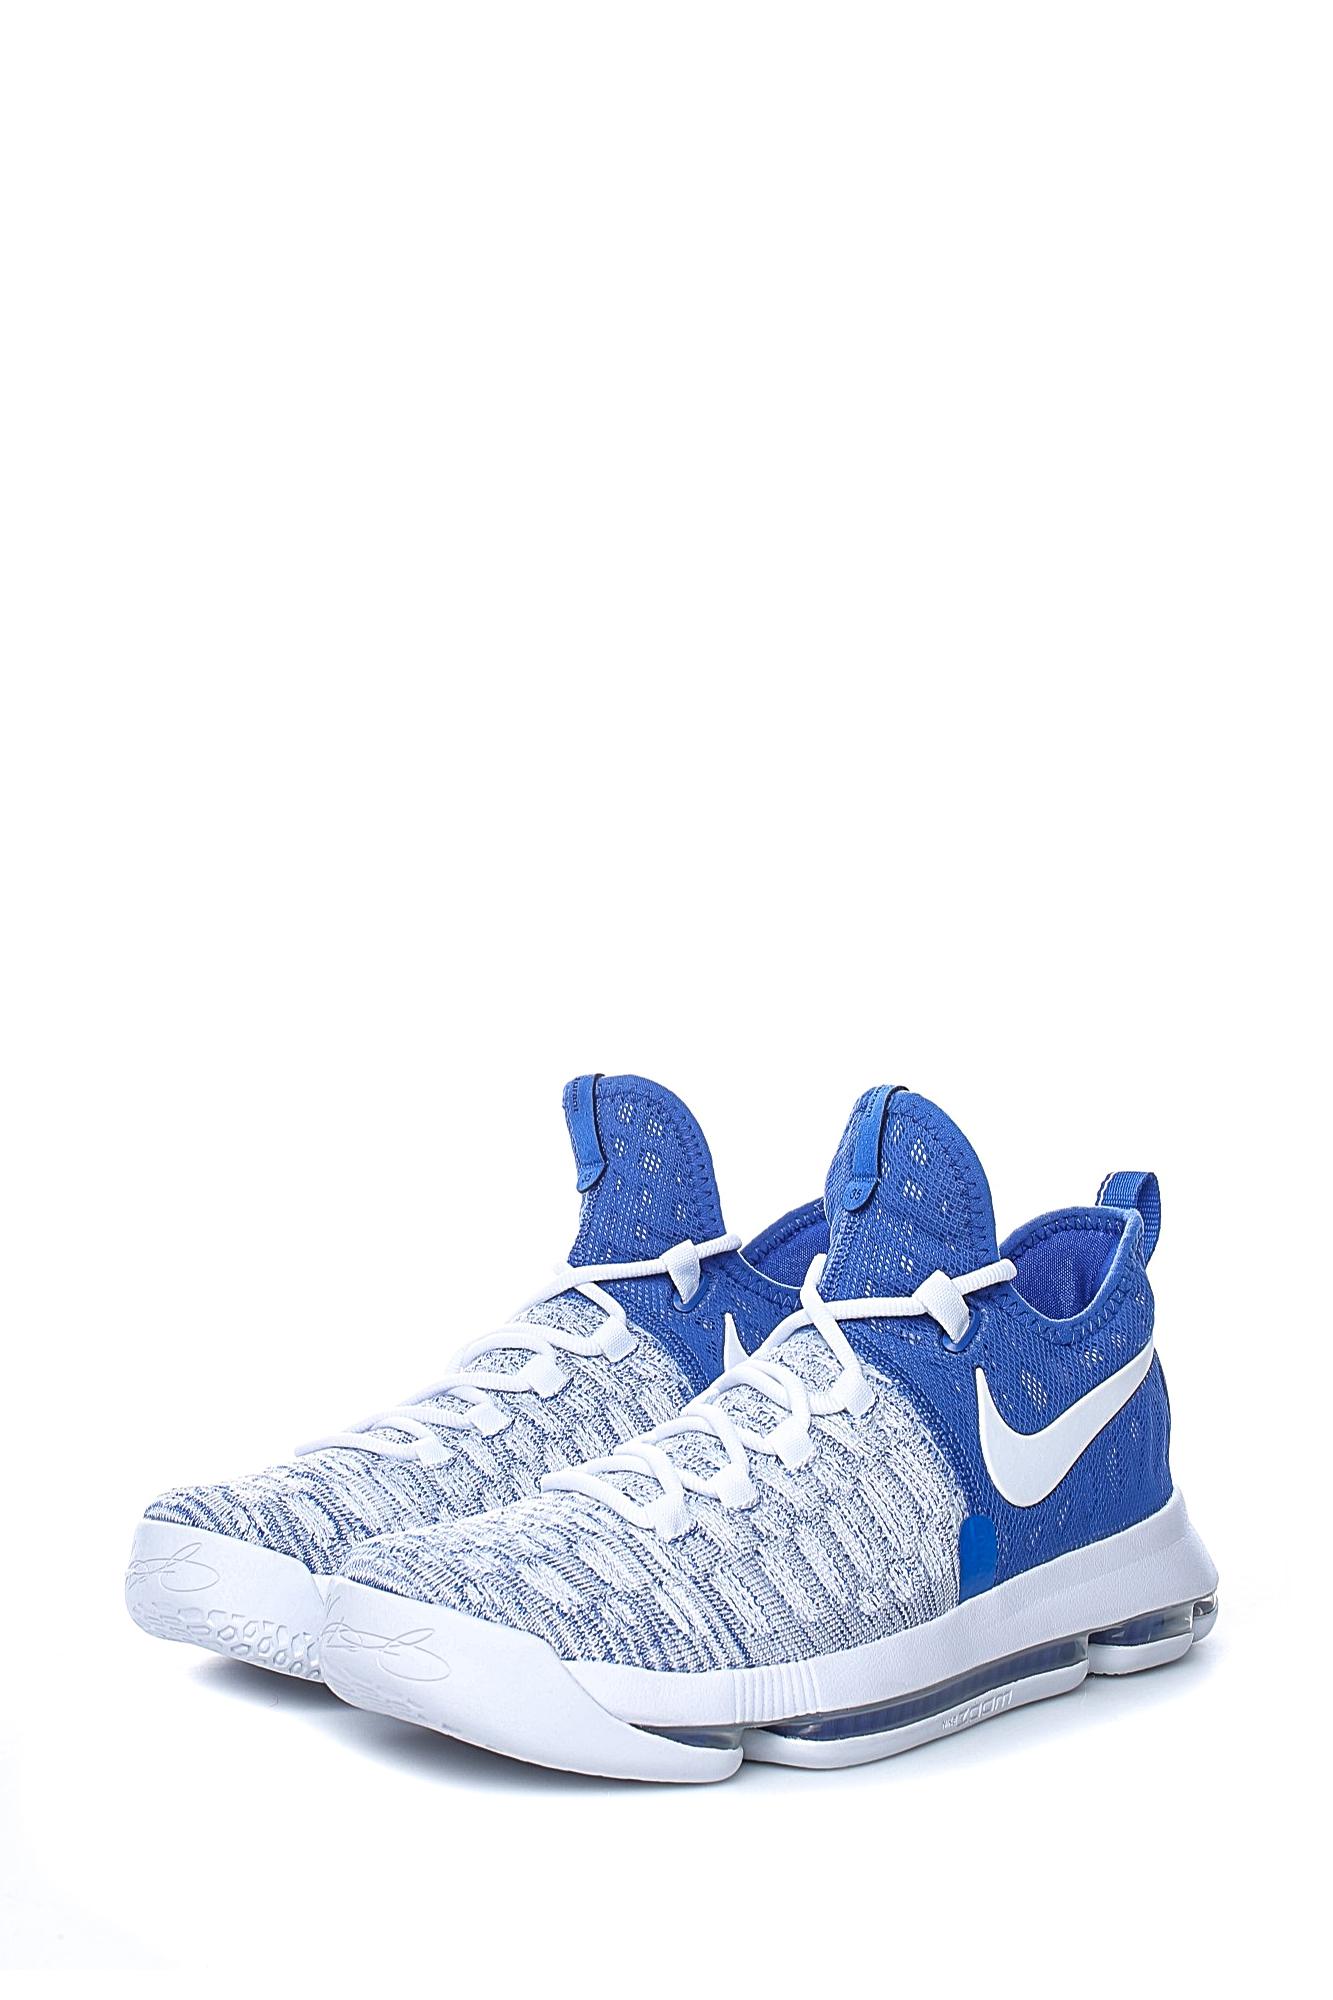 549864cea1d4 NIKE - Ανδρικά παπούτσια για μπάσκετ Nike ZOOM KD 9 μπλε - λευκά ...